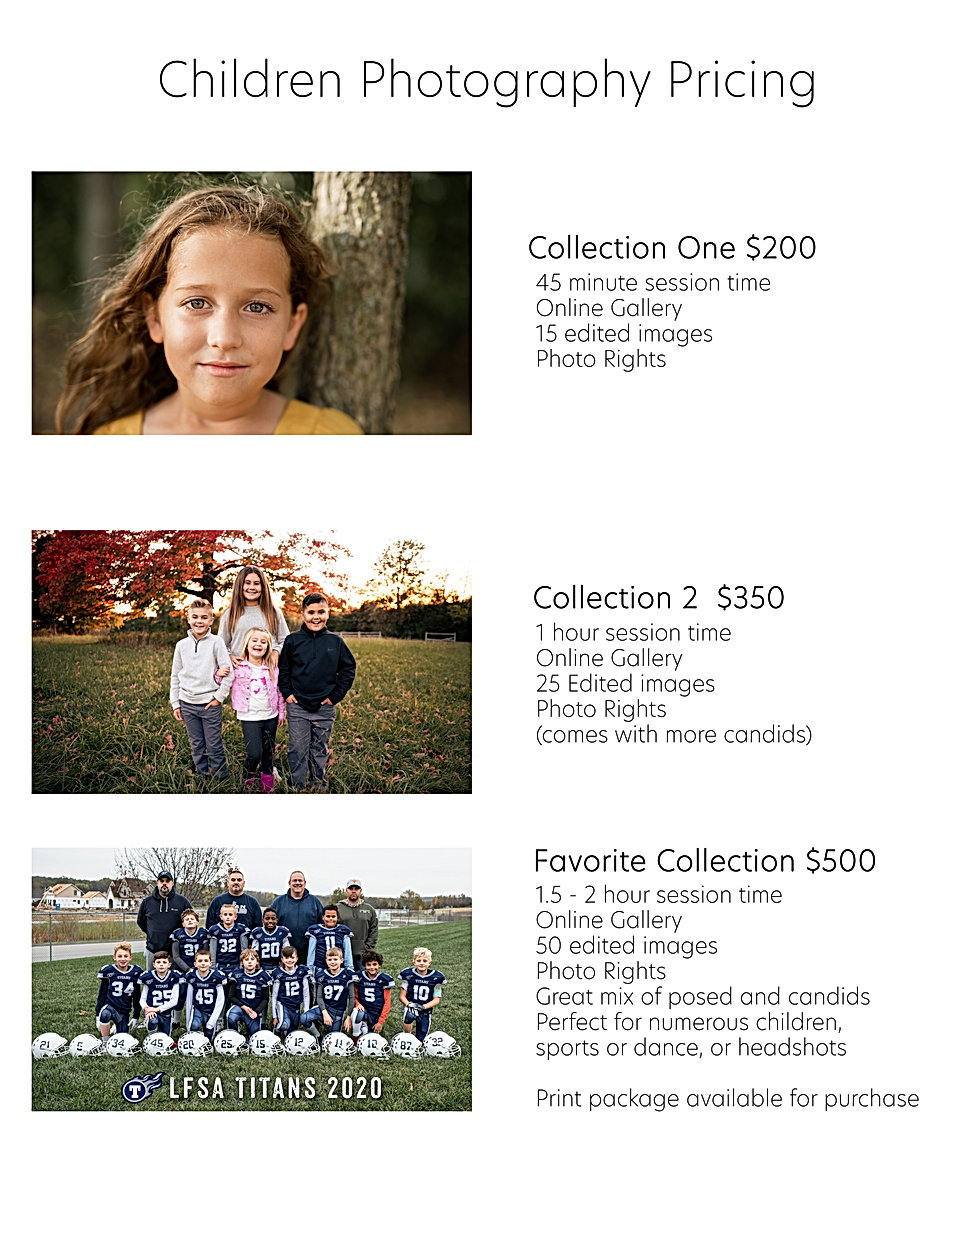 Children Photography Pricing.jpg